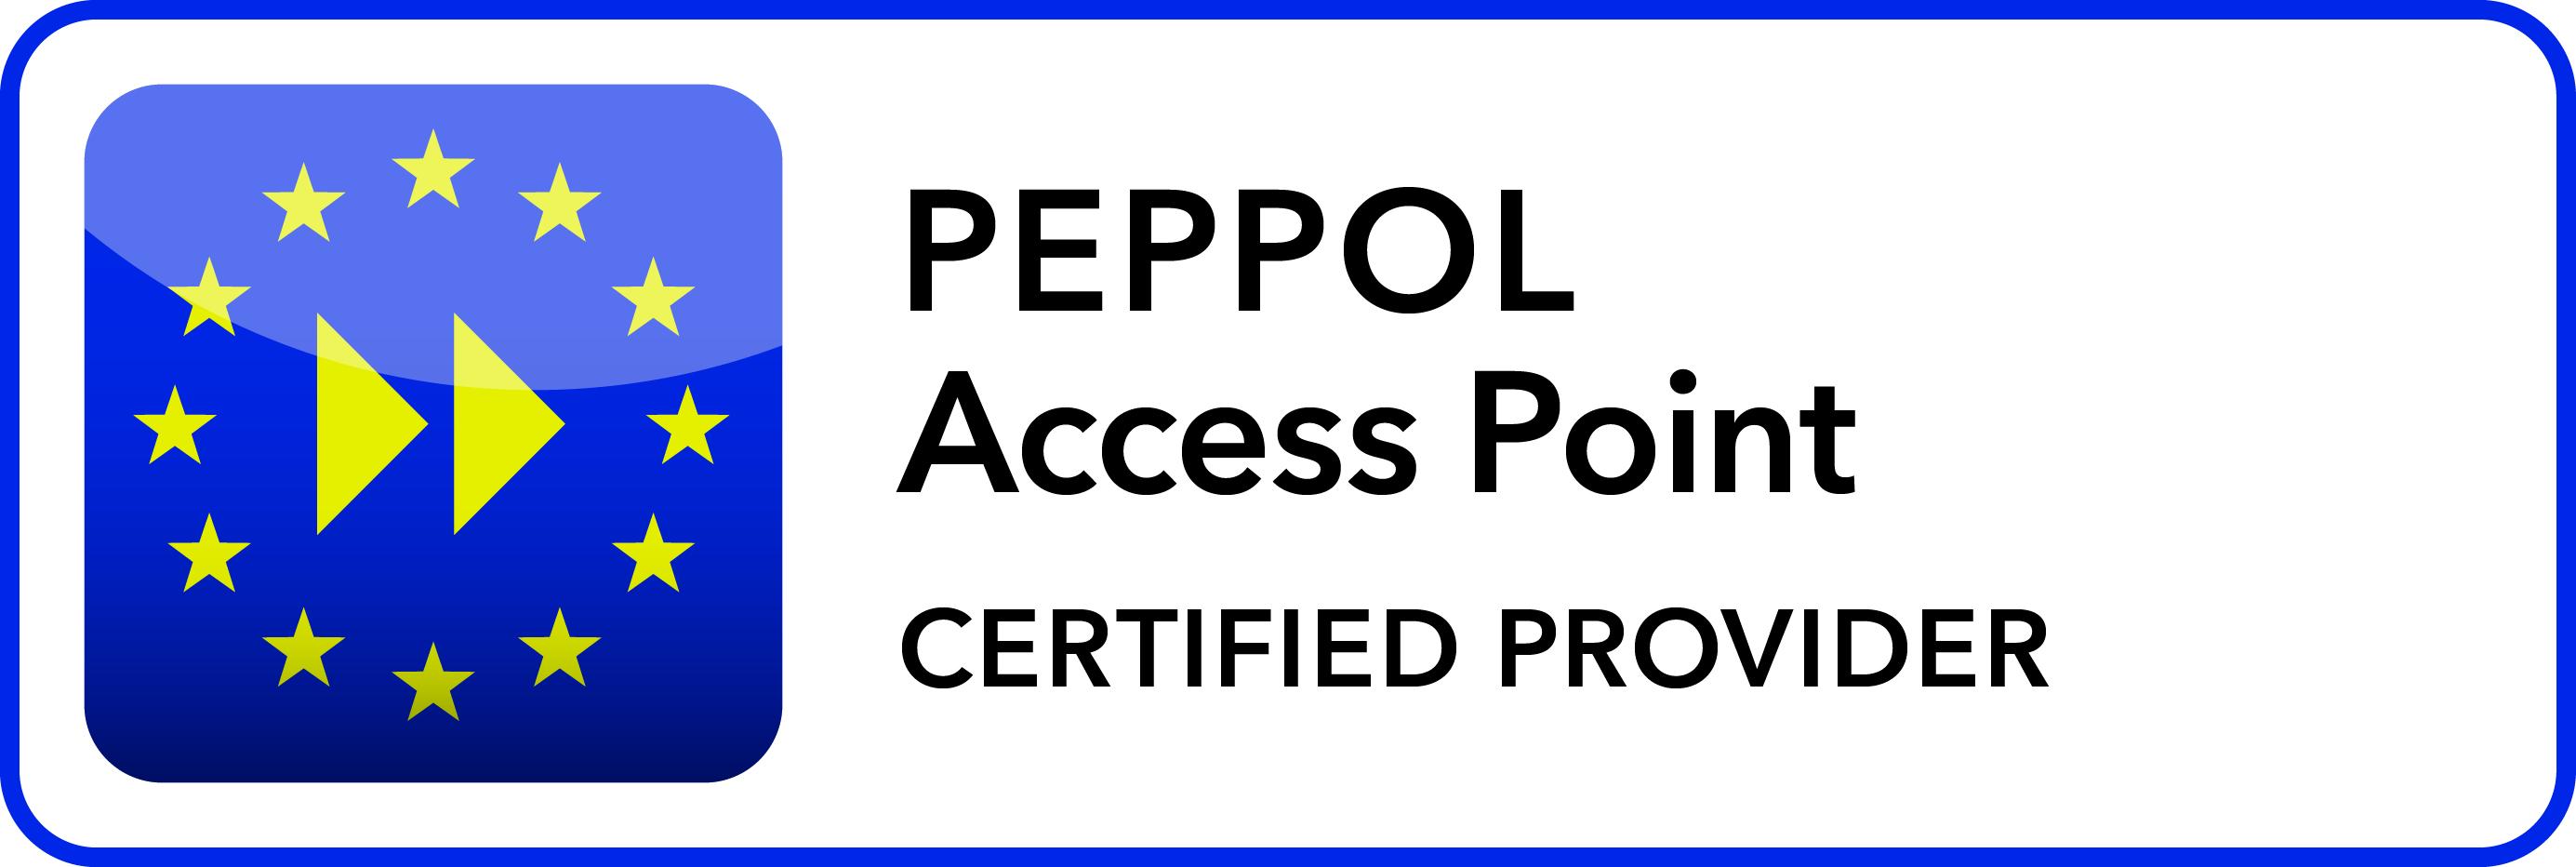 PEPPOL-Access-Point-CMYK